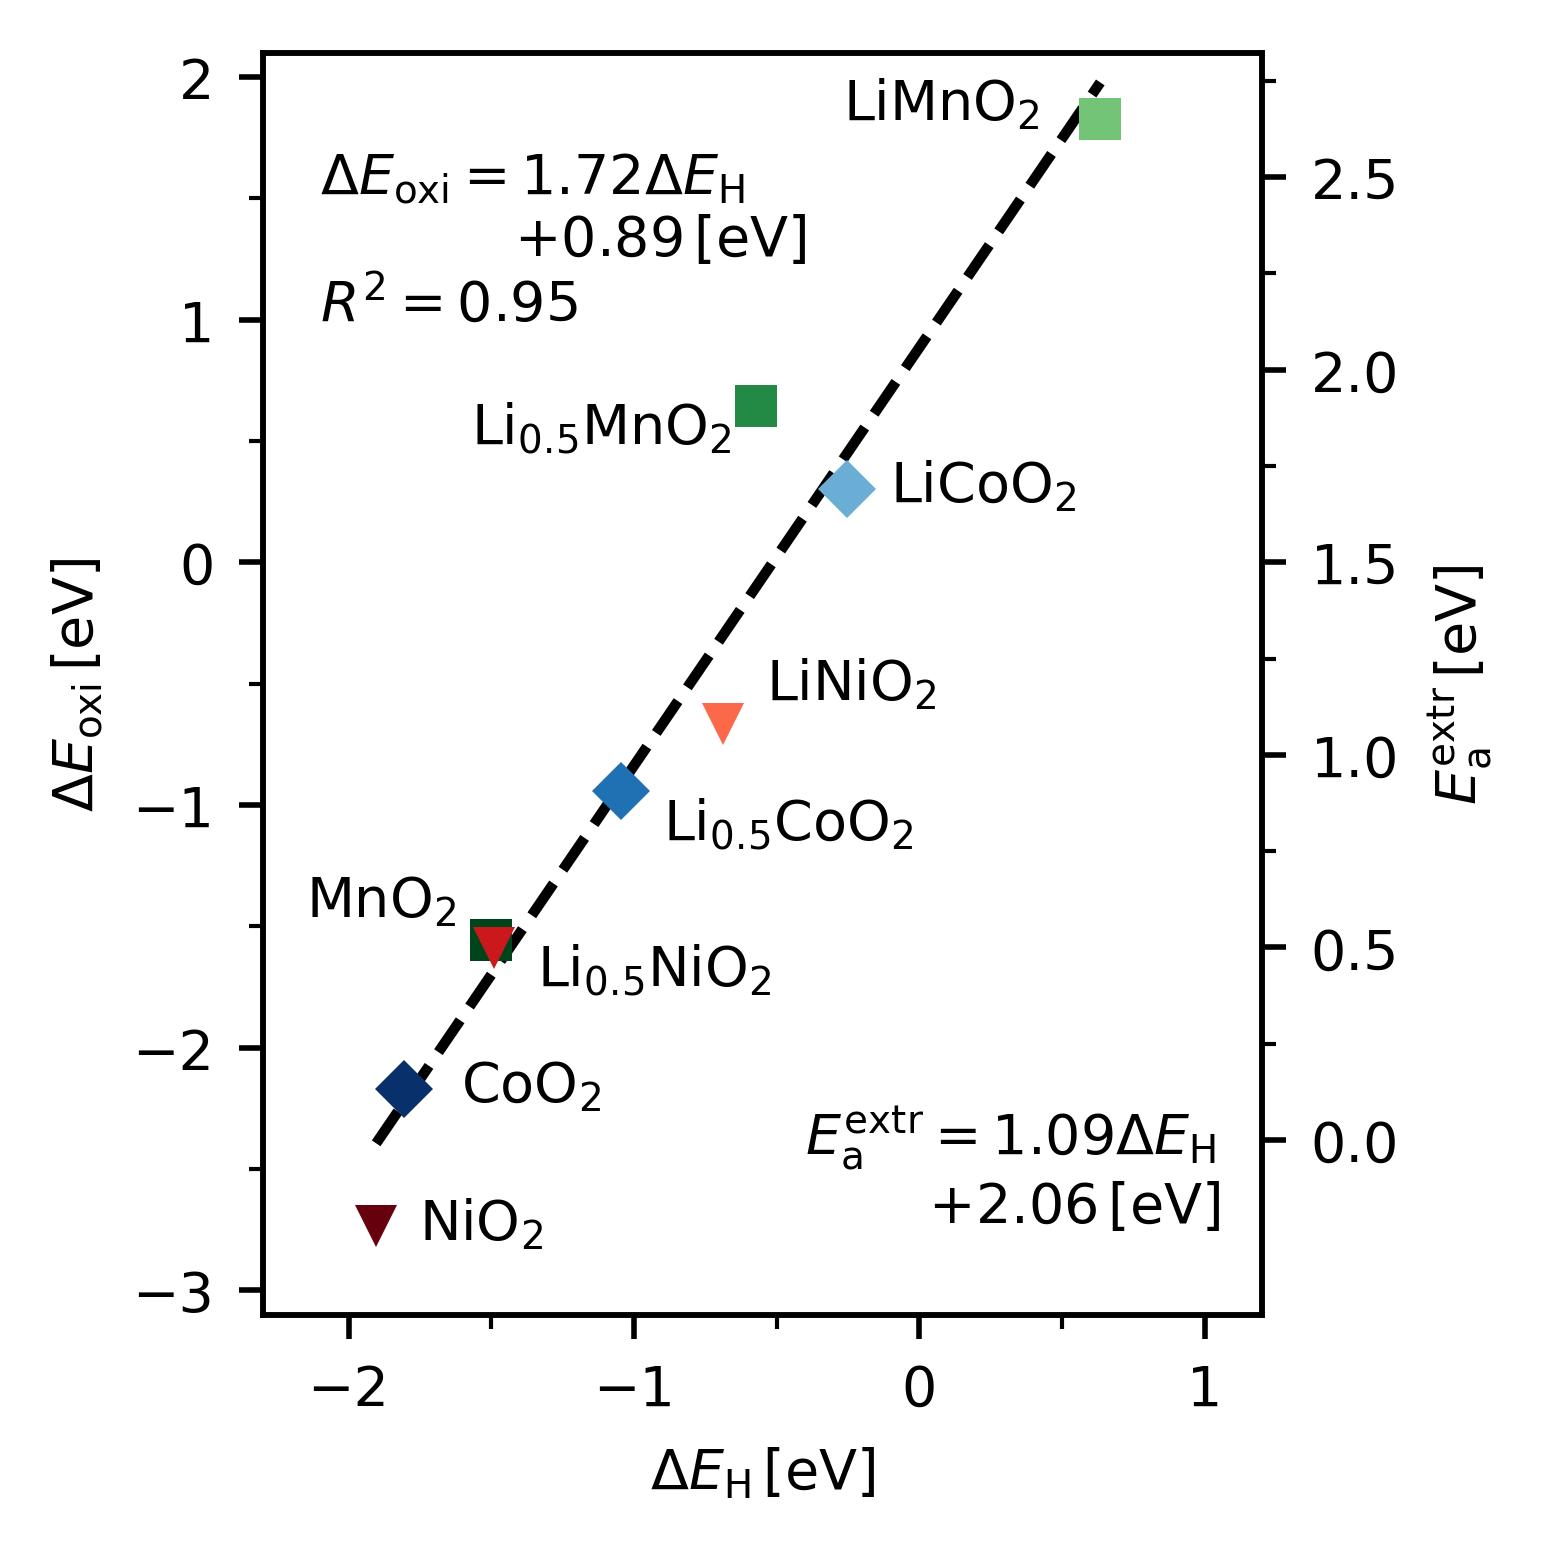 Oxidation of Ethylene Carbonate on Li Metal Oxide Surfaces